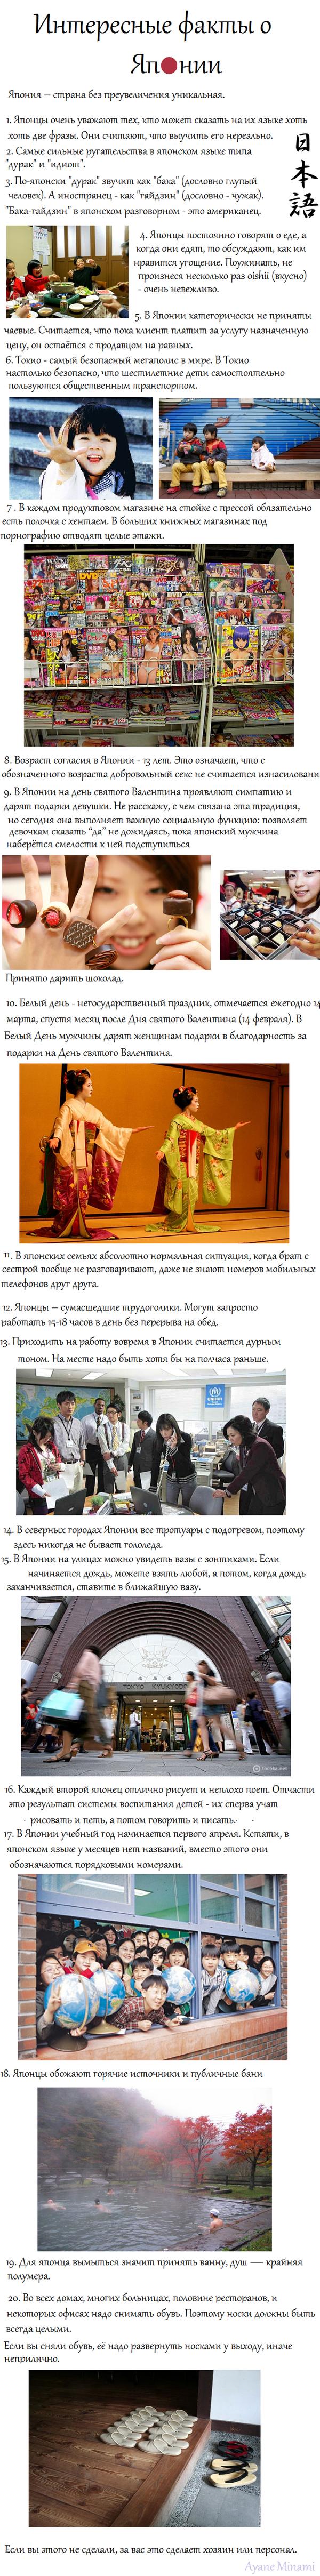 http://se.uploads.ru/t/rdhBx.png